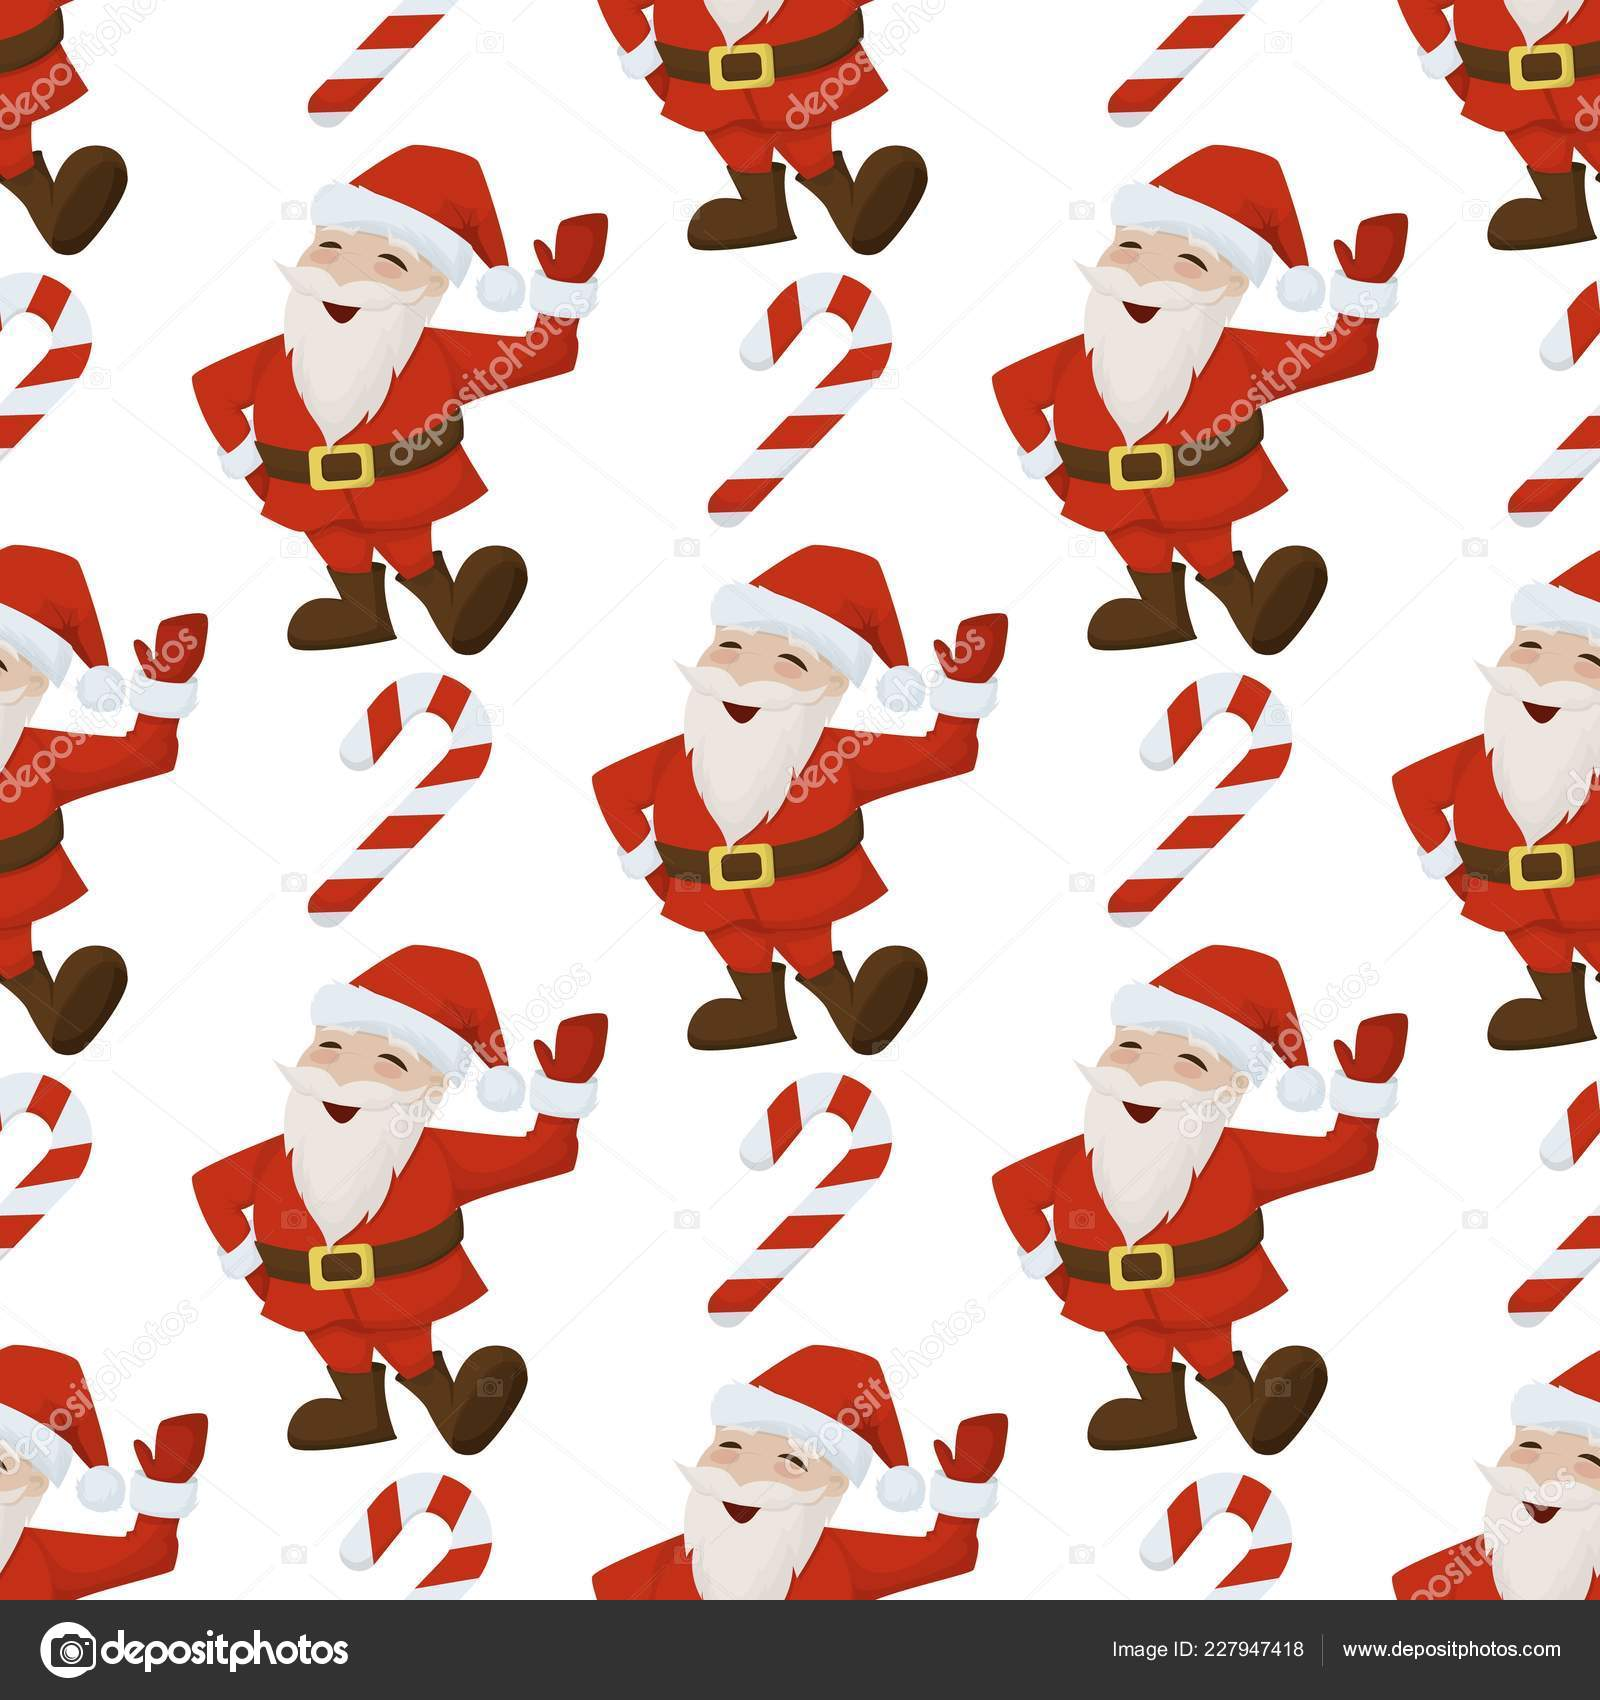 depositphotos 227947418 stock illustration christmas santa candy cane seamless